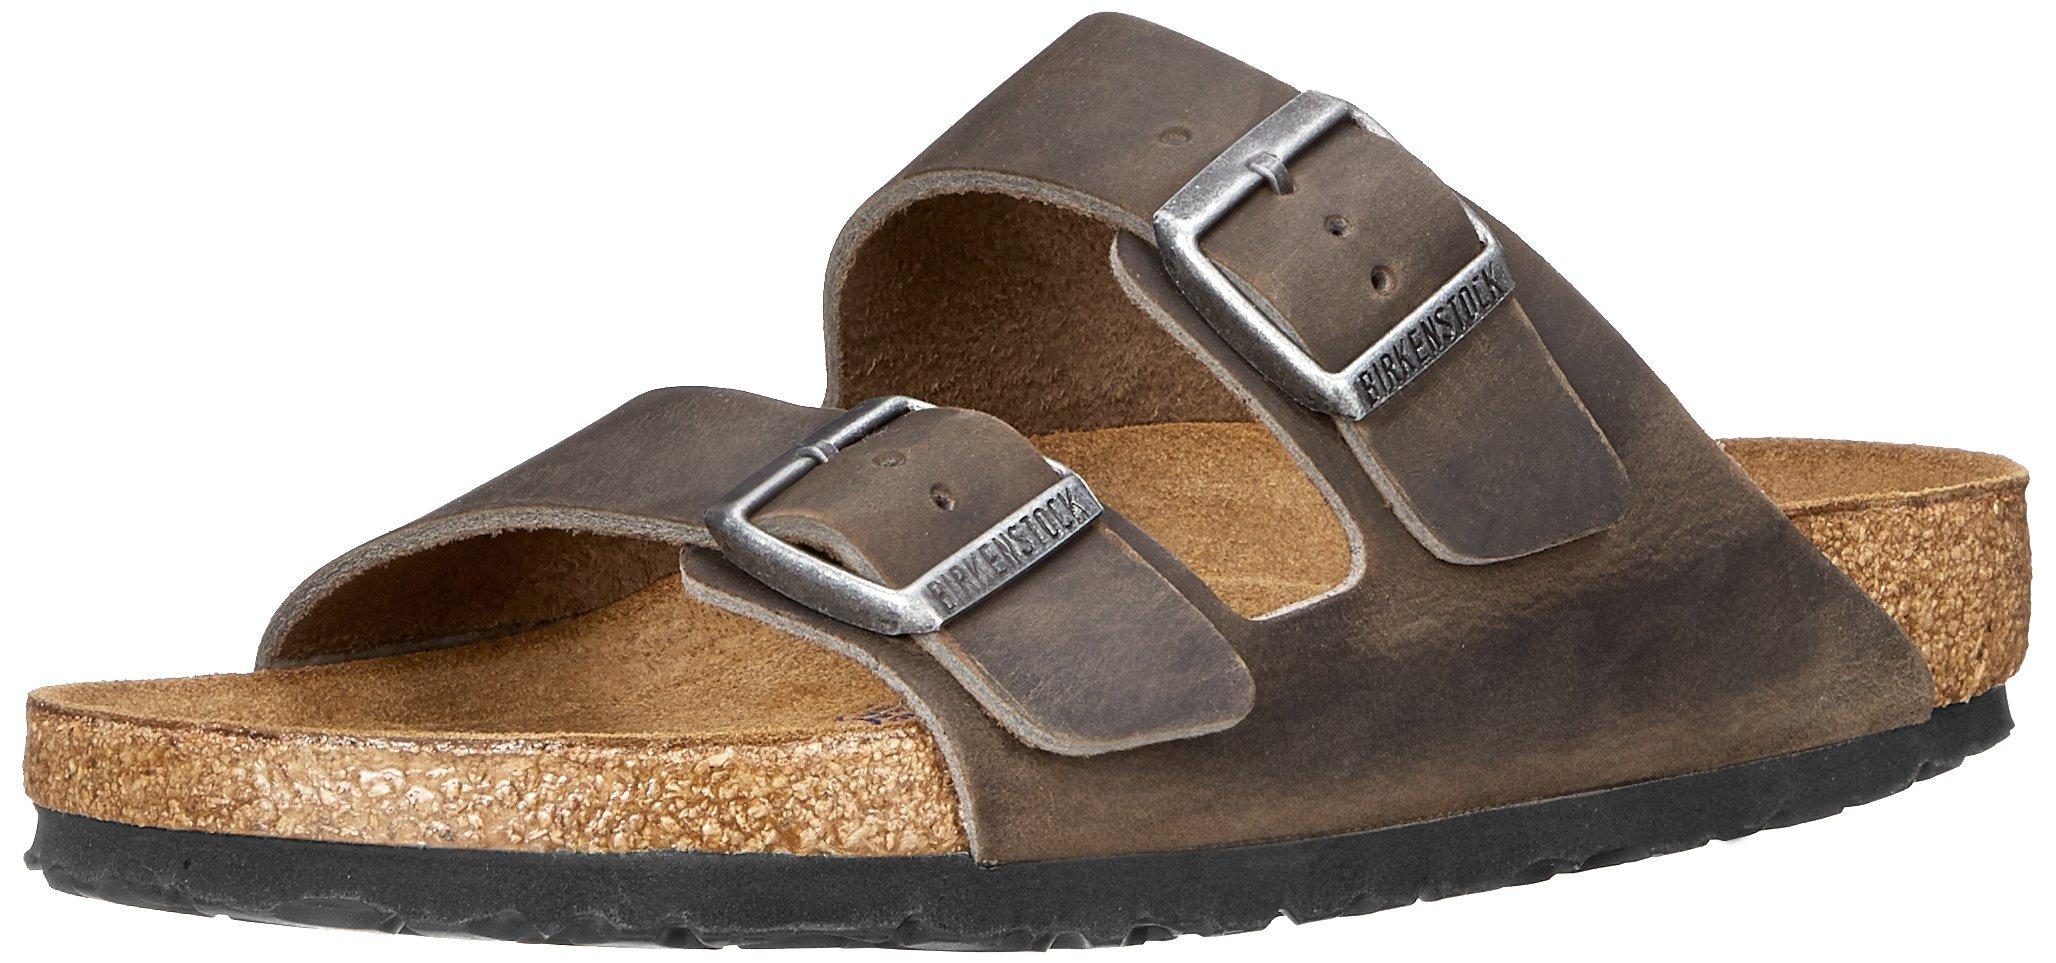 Birkenstock Arizona Birkibuc Sandal,Iron Oiled Leather,39 M EU/8-8.5 B(M) US Women